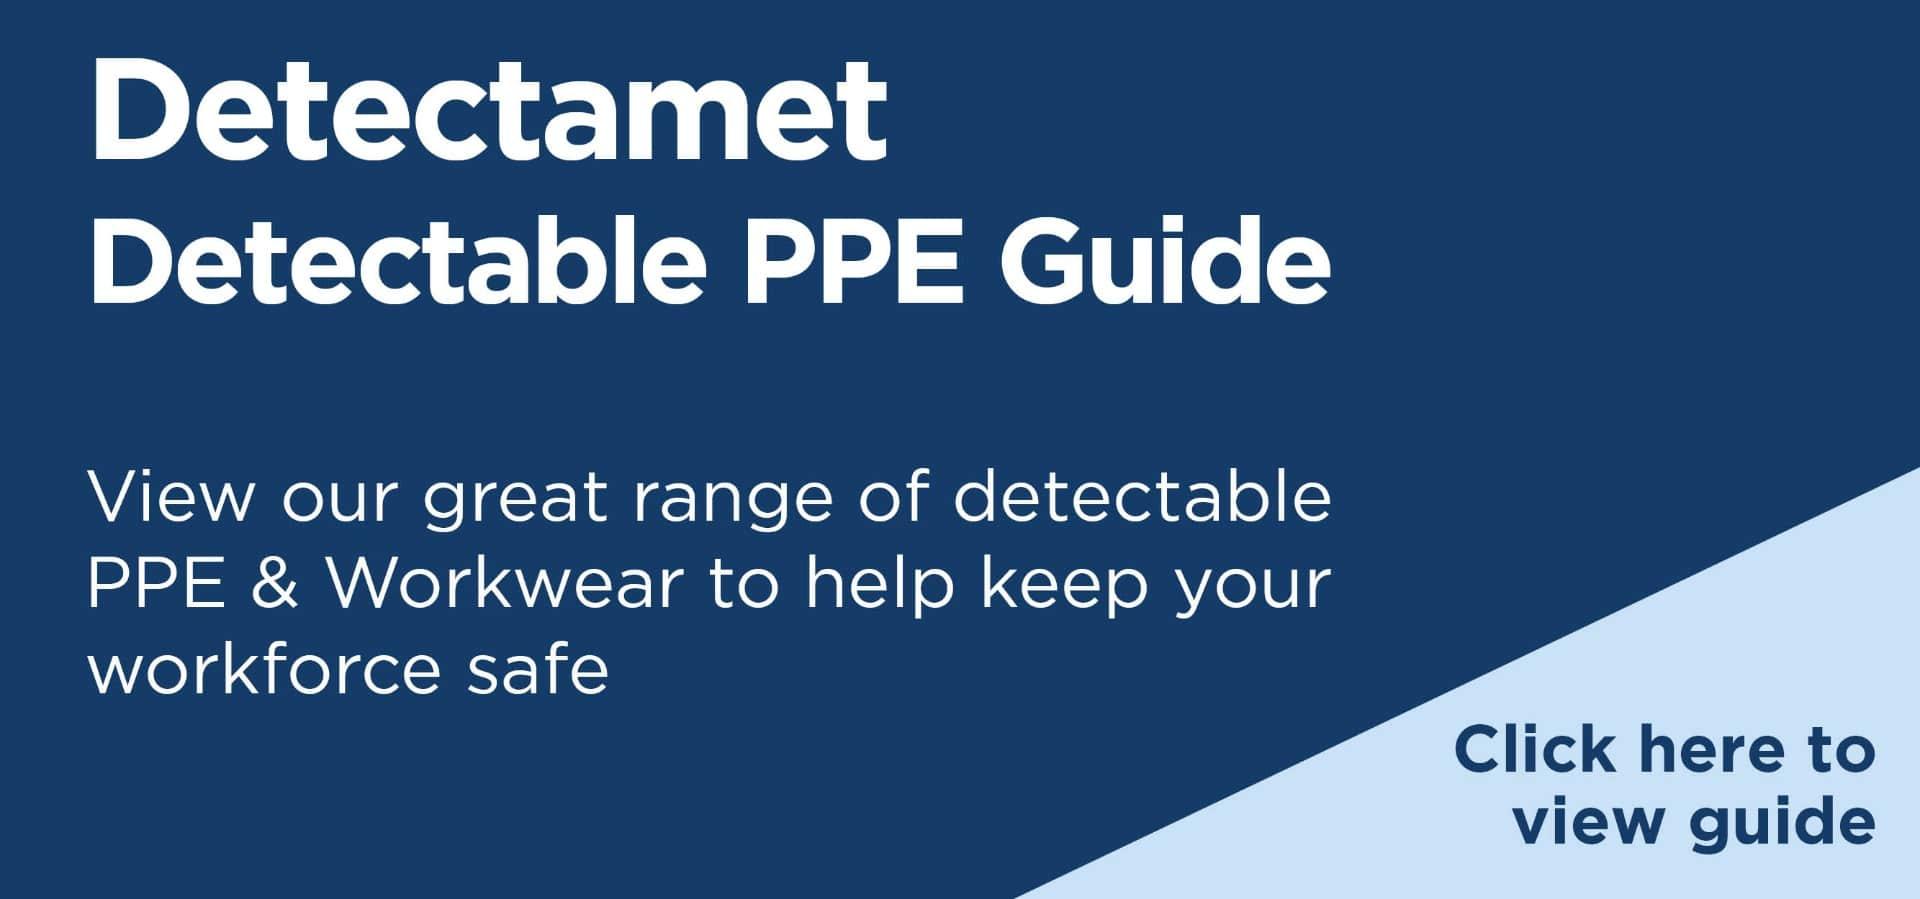 Detectamet Detectable PPE Guide